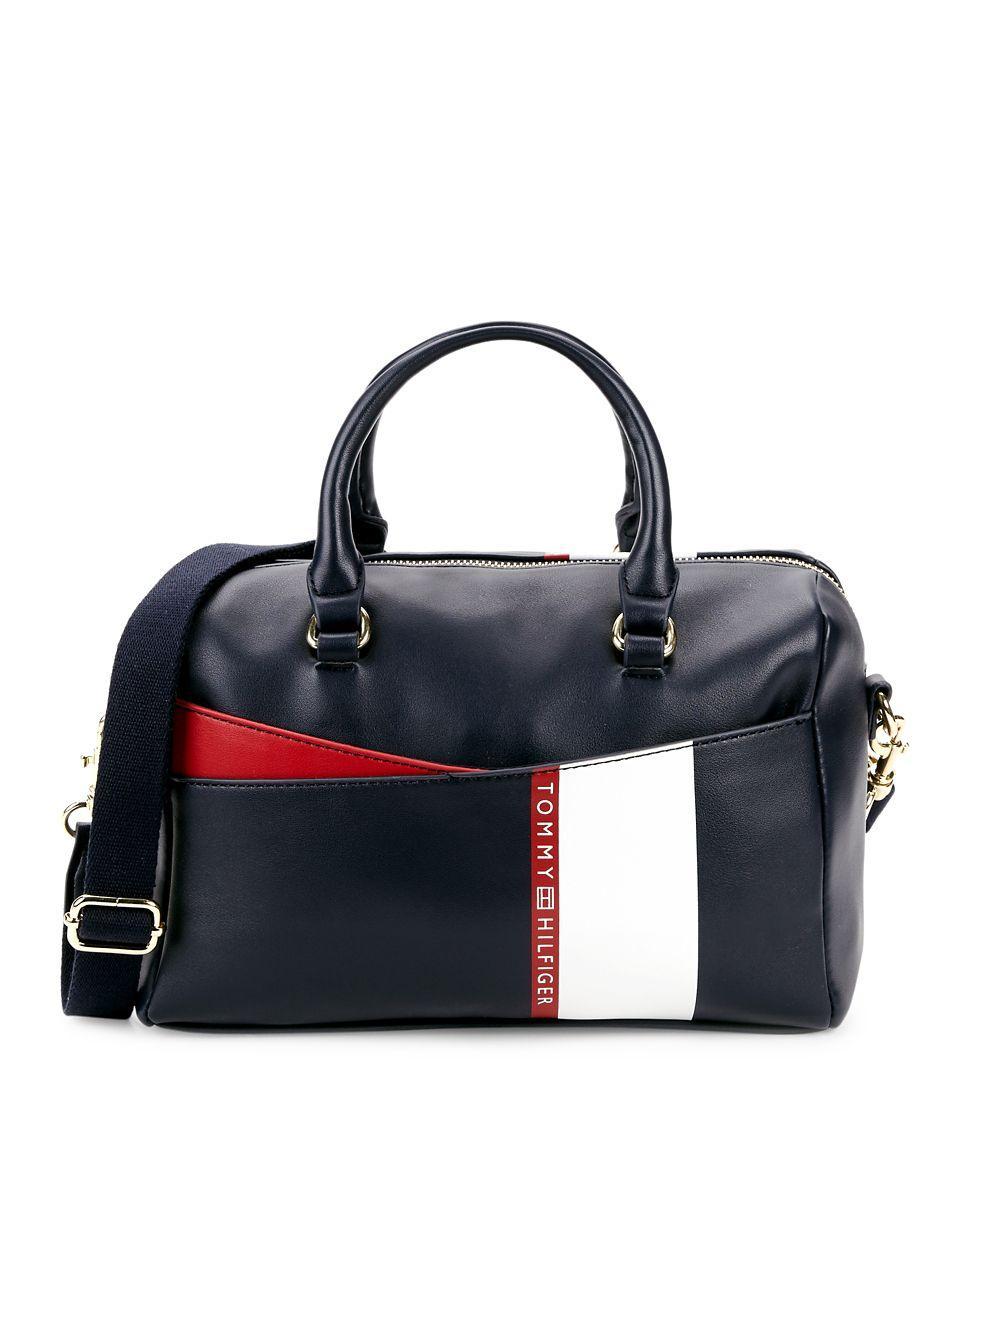 d5096477ab1 Tommy Hilfiger Ruby Mini Satchel Bag in Blue - Lyst